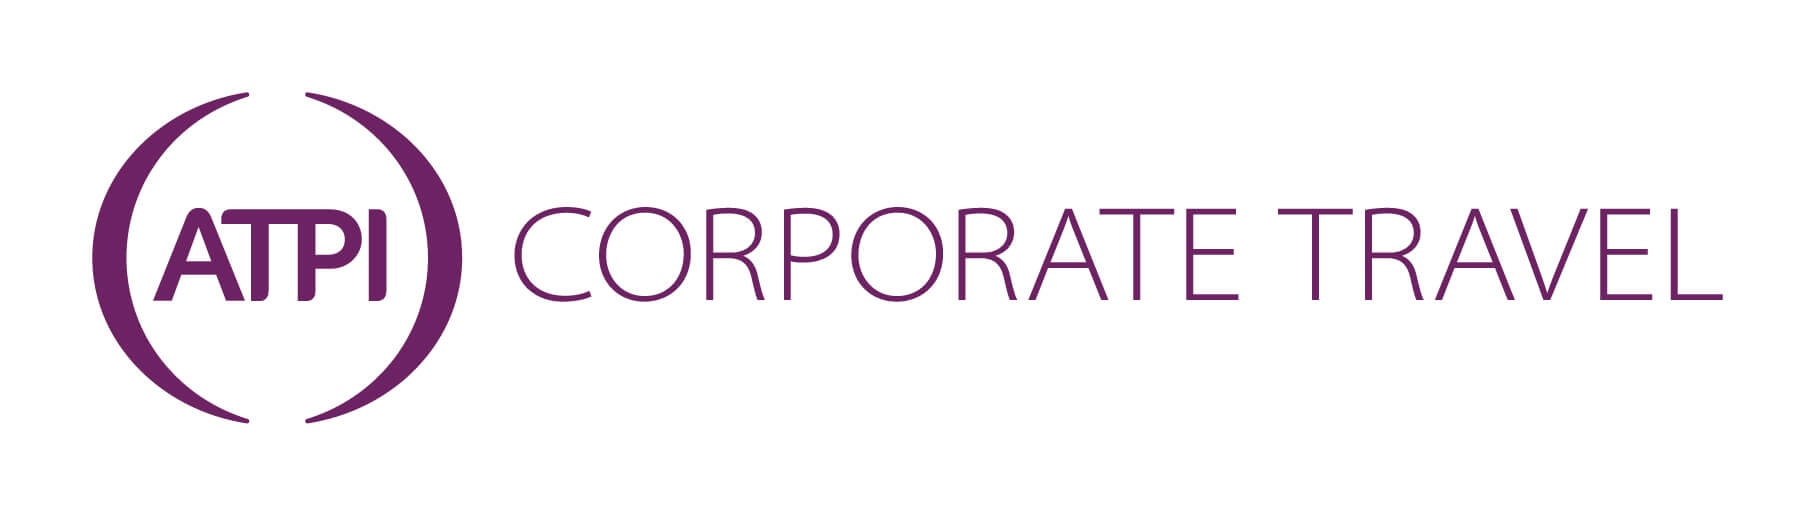 logo-ATPI corporate travel-RGB